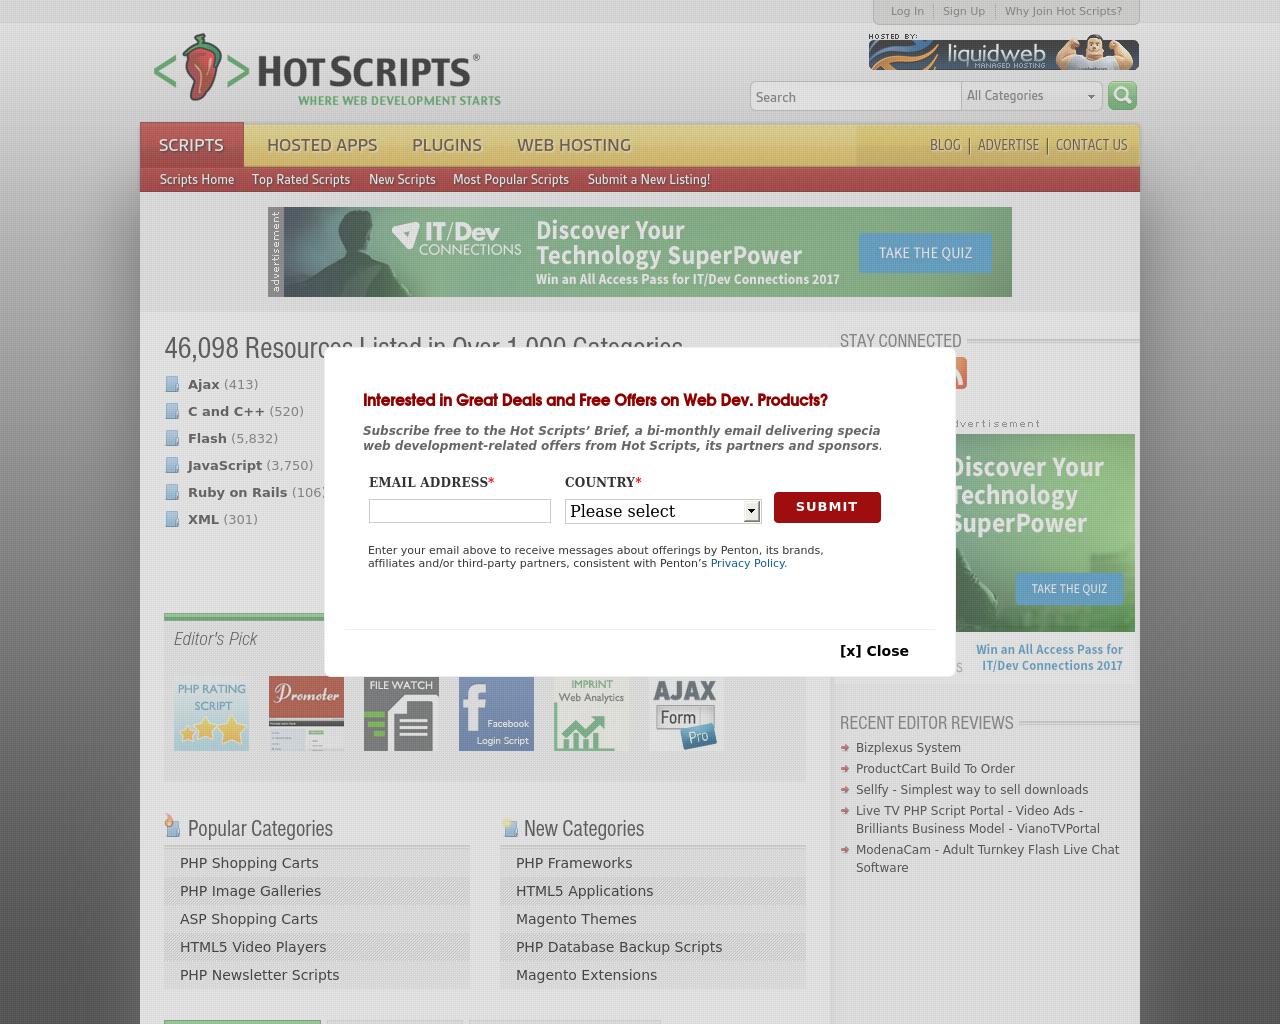 HotScripts-Advertising-Reviews-Pricing